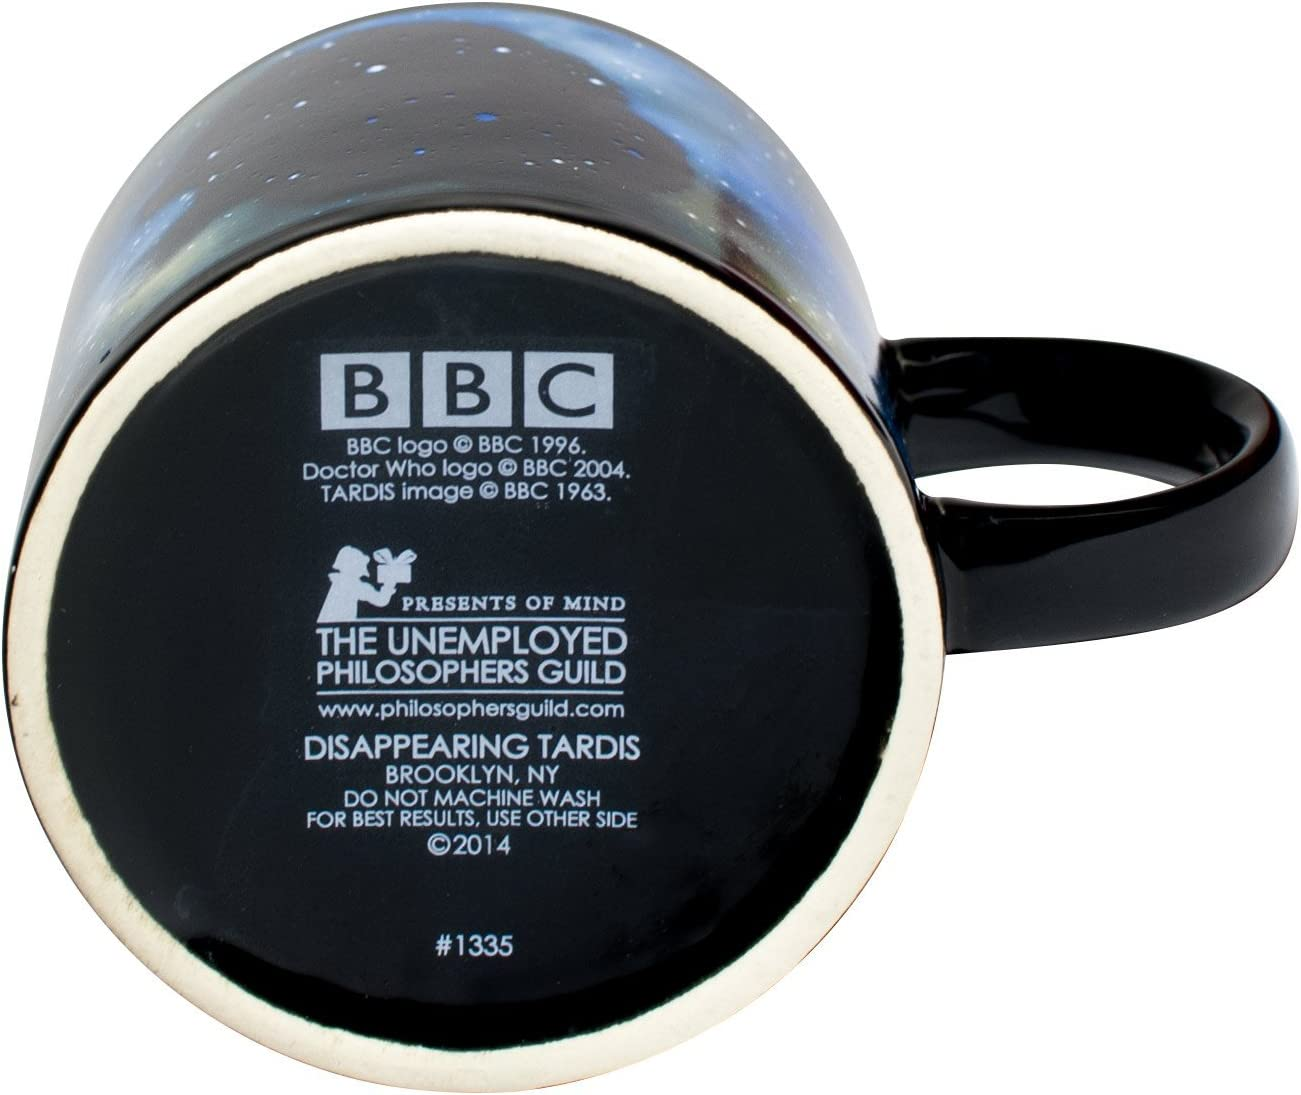 1605 Doctor Who Disappearing Tardis 12oz Ceramic Mug Coffee Cup BBC Time Lord